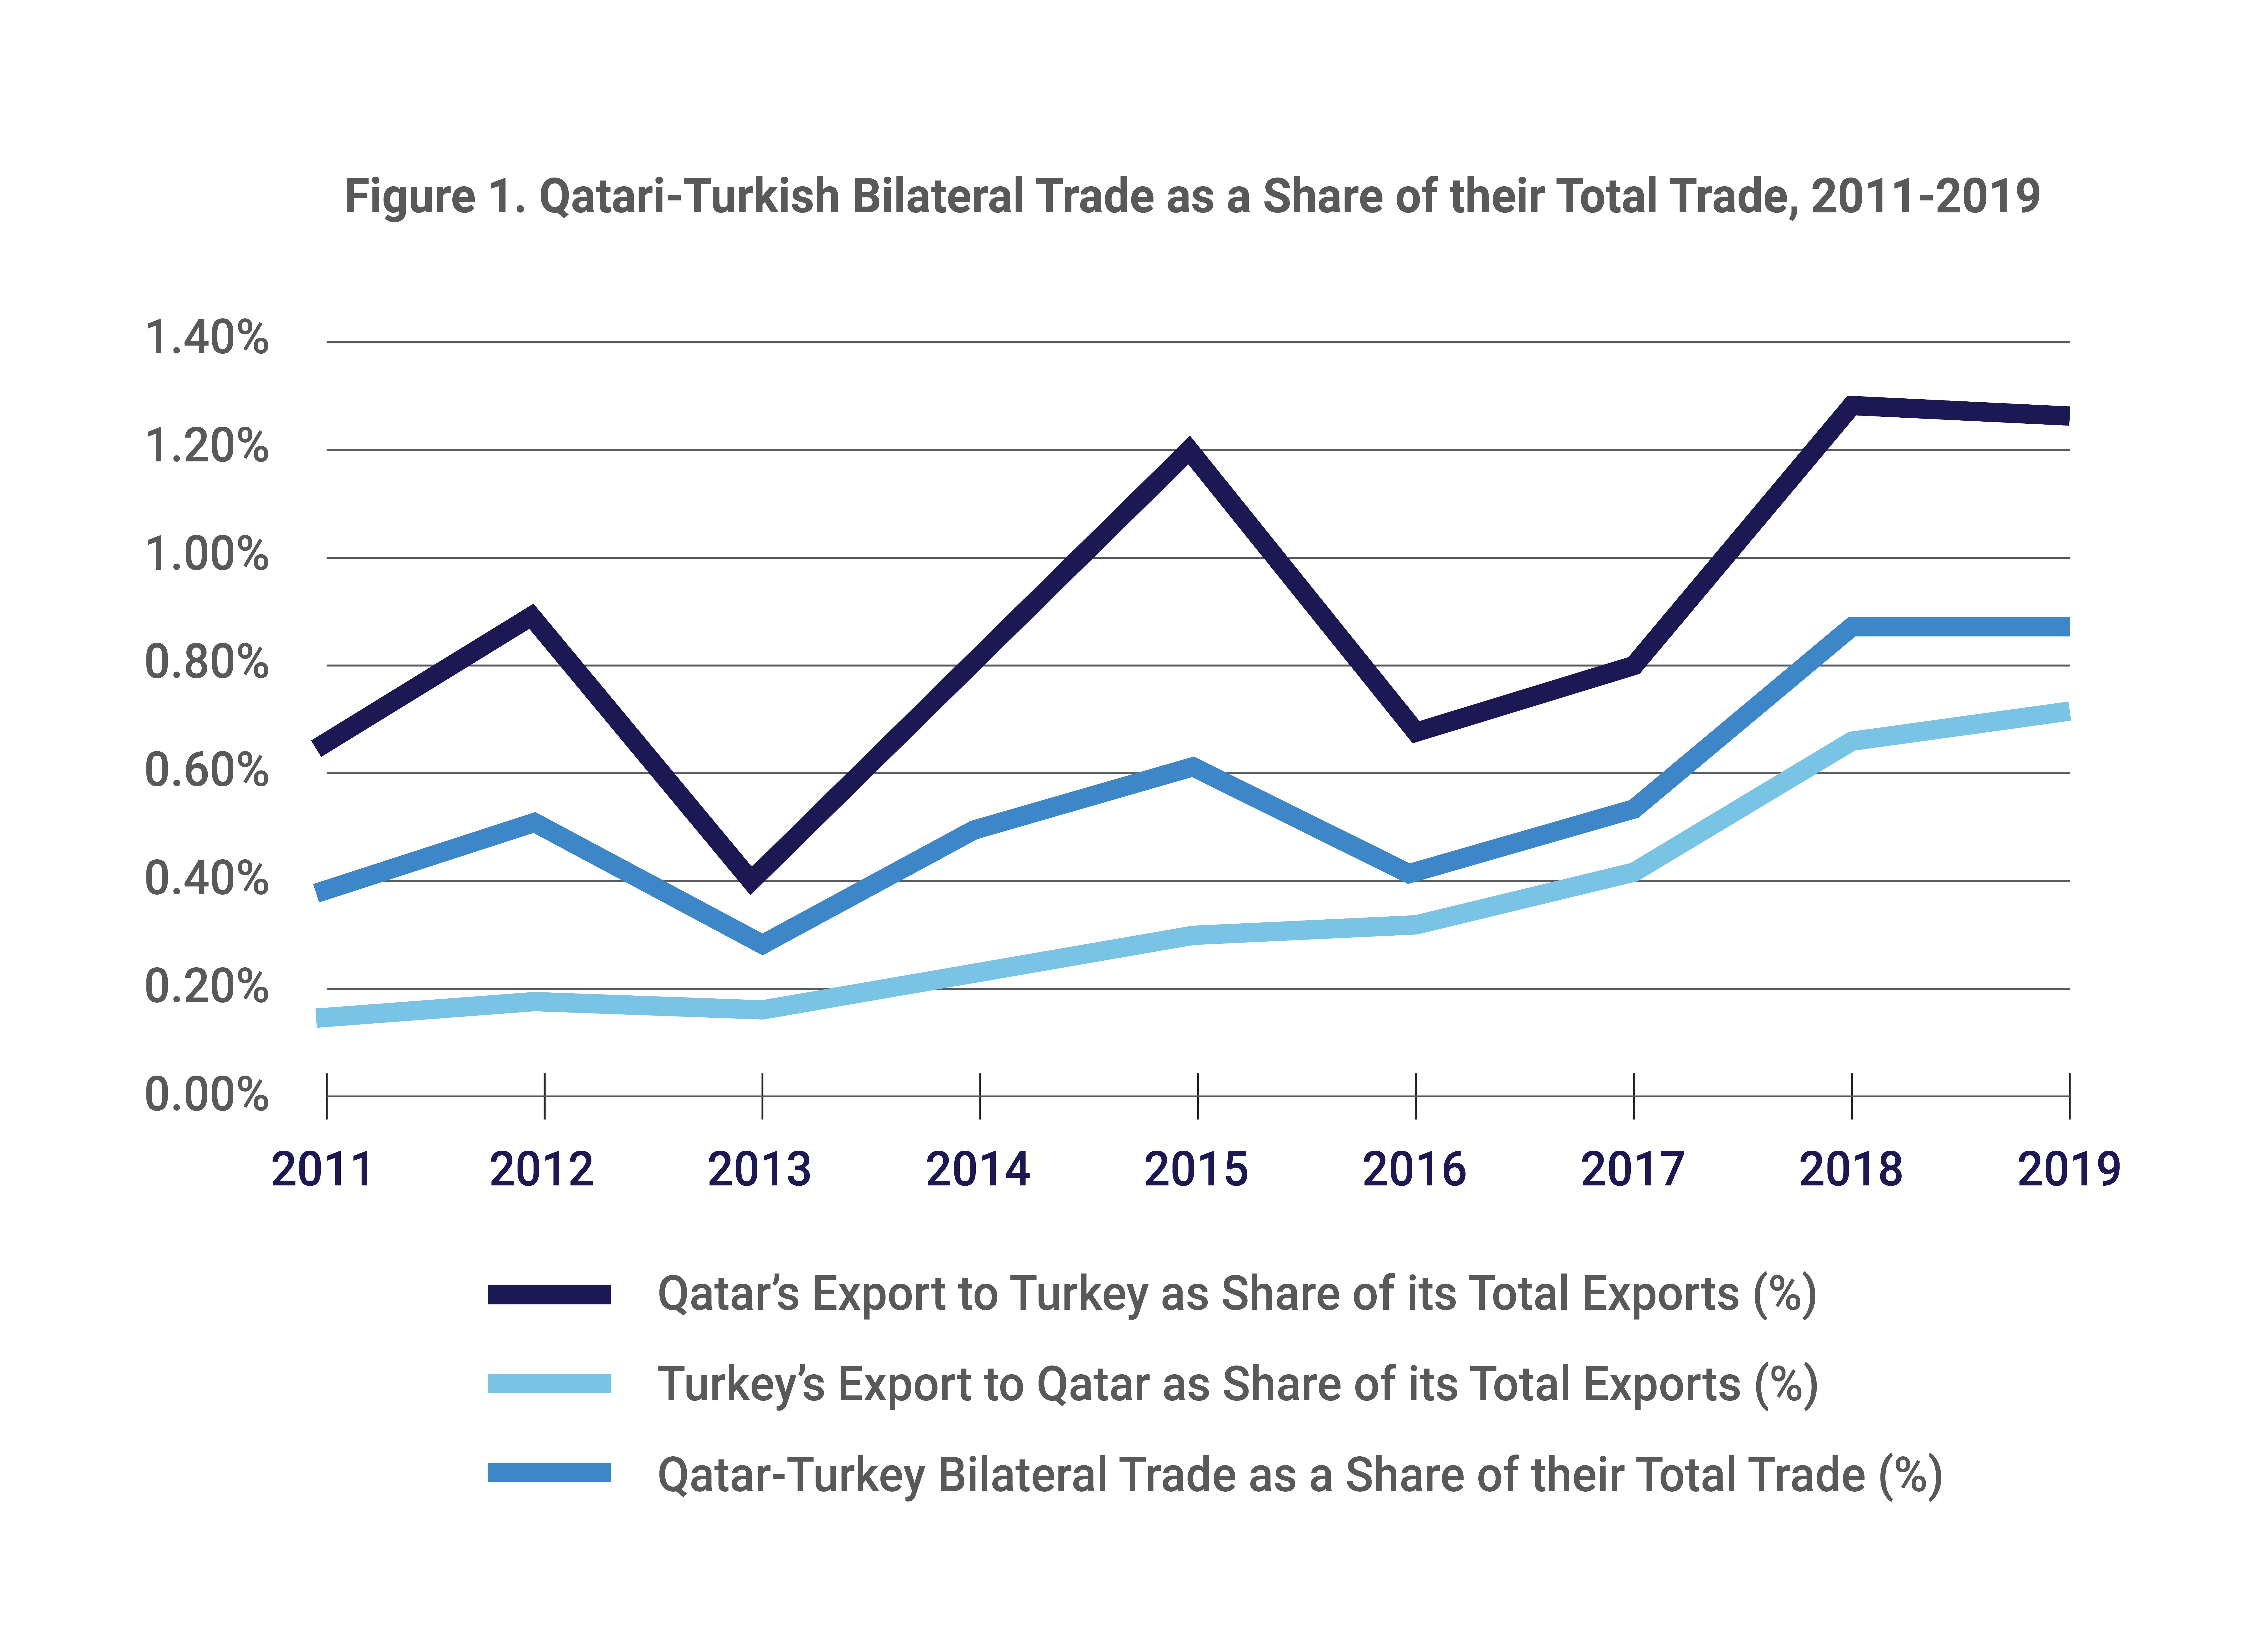 Figure 1. Qatari-Turkish Bilateral Trade as a Share of their Total Trade, 2011-2019